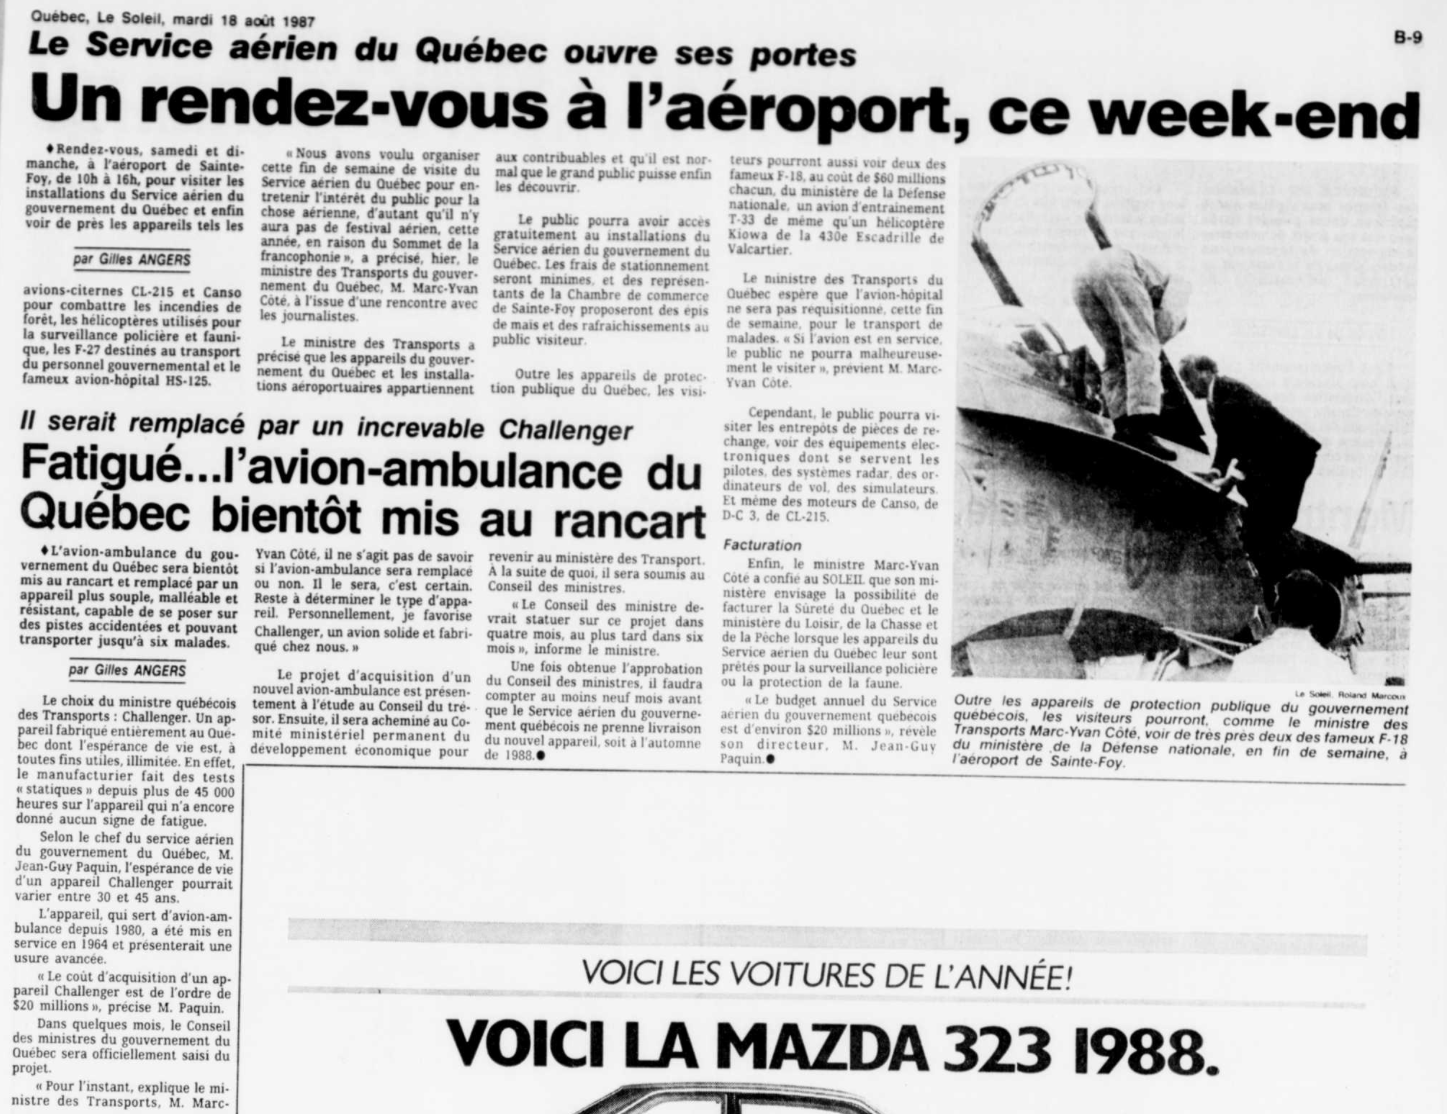 Journal Le Soleil 18 août 1987